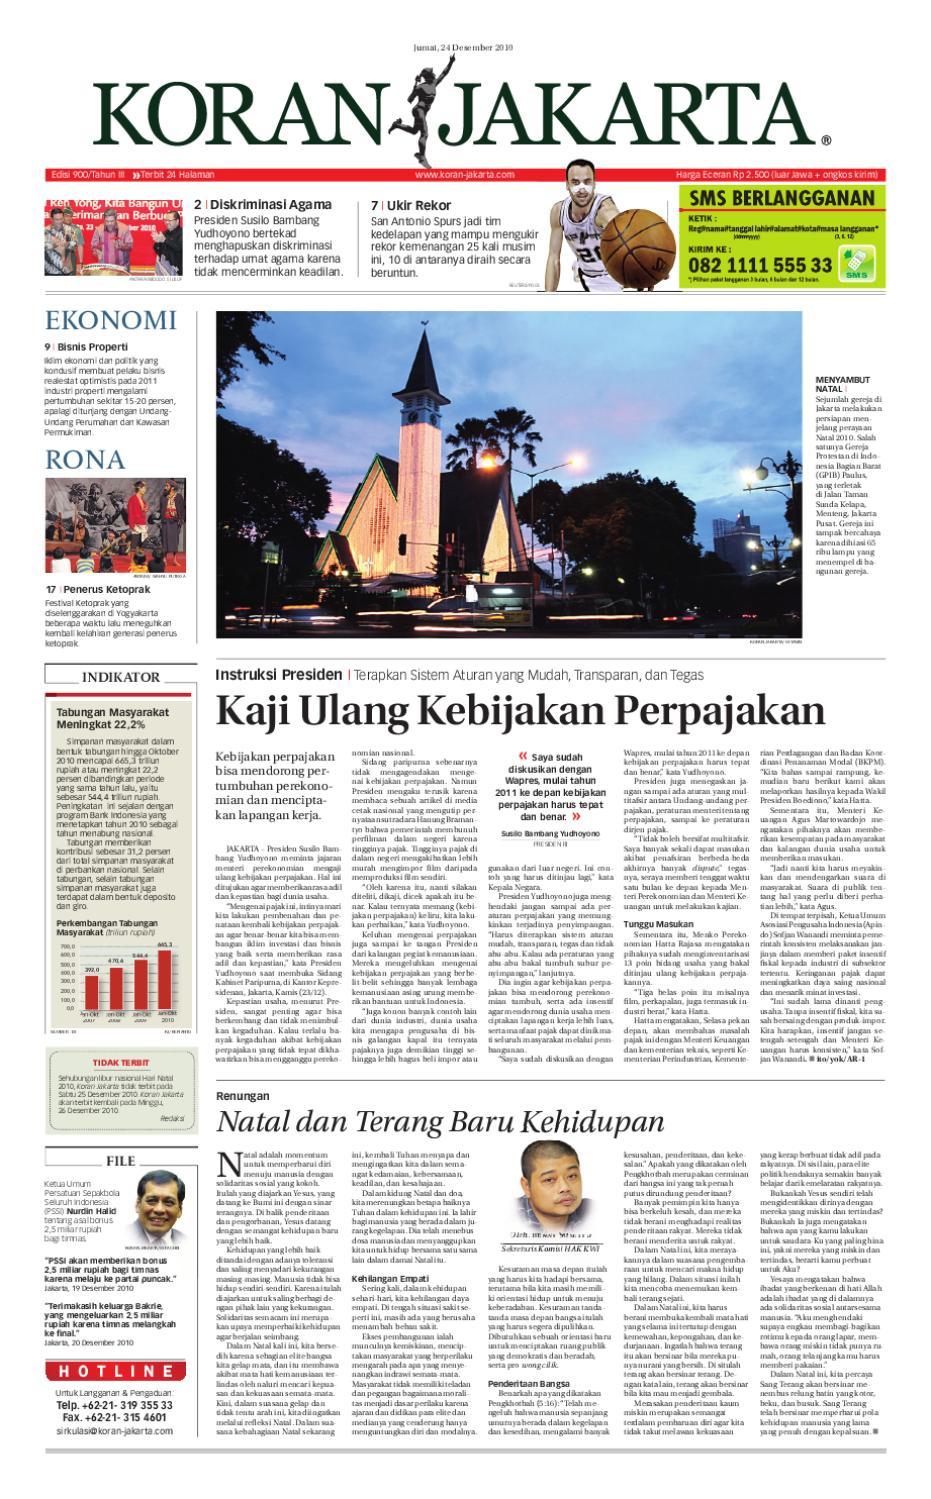 EDISI 900 - 24 DESEMBER 2010 by PT. Berita Nusantara - issuu 1604c93a69